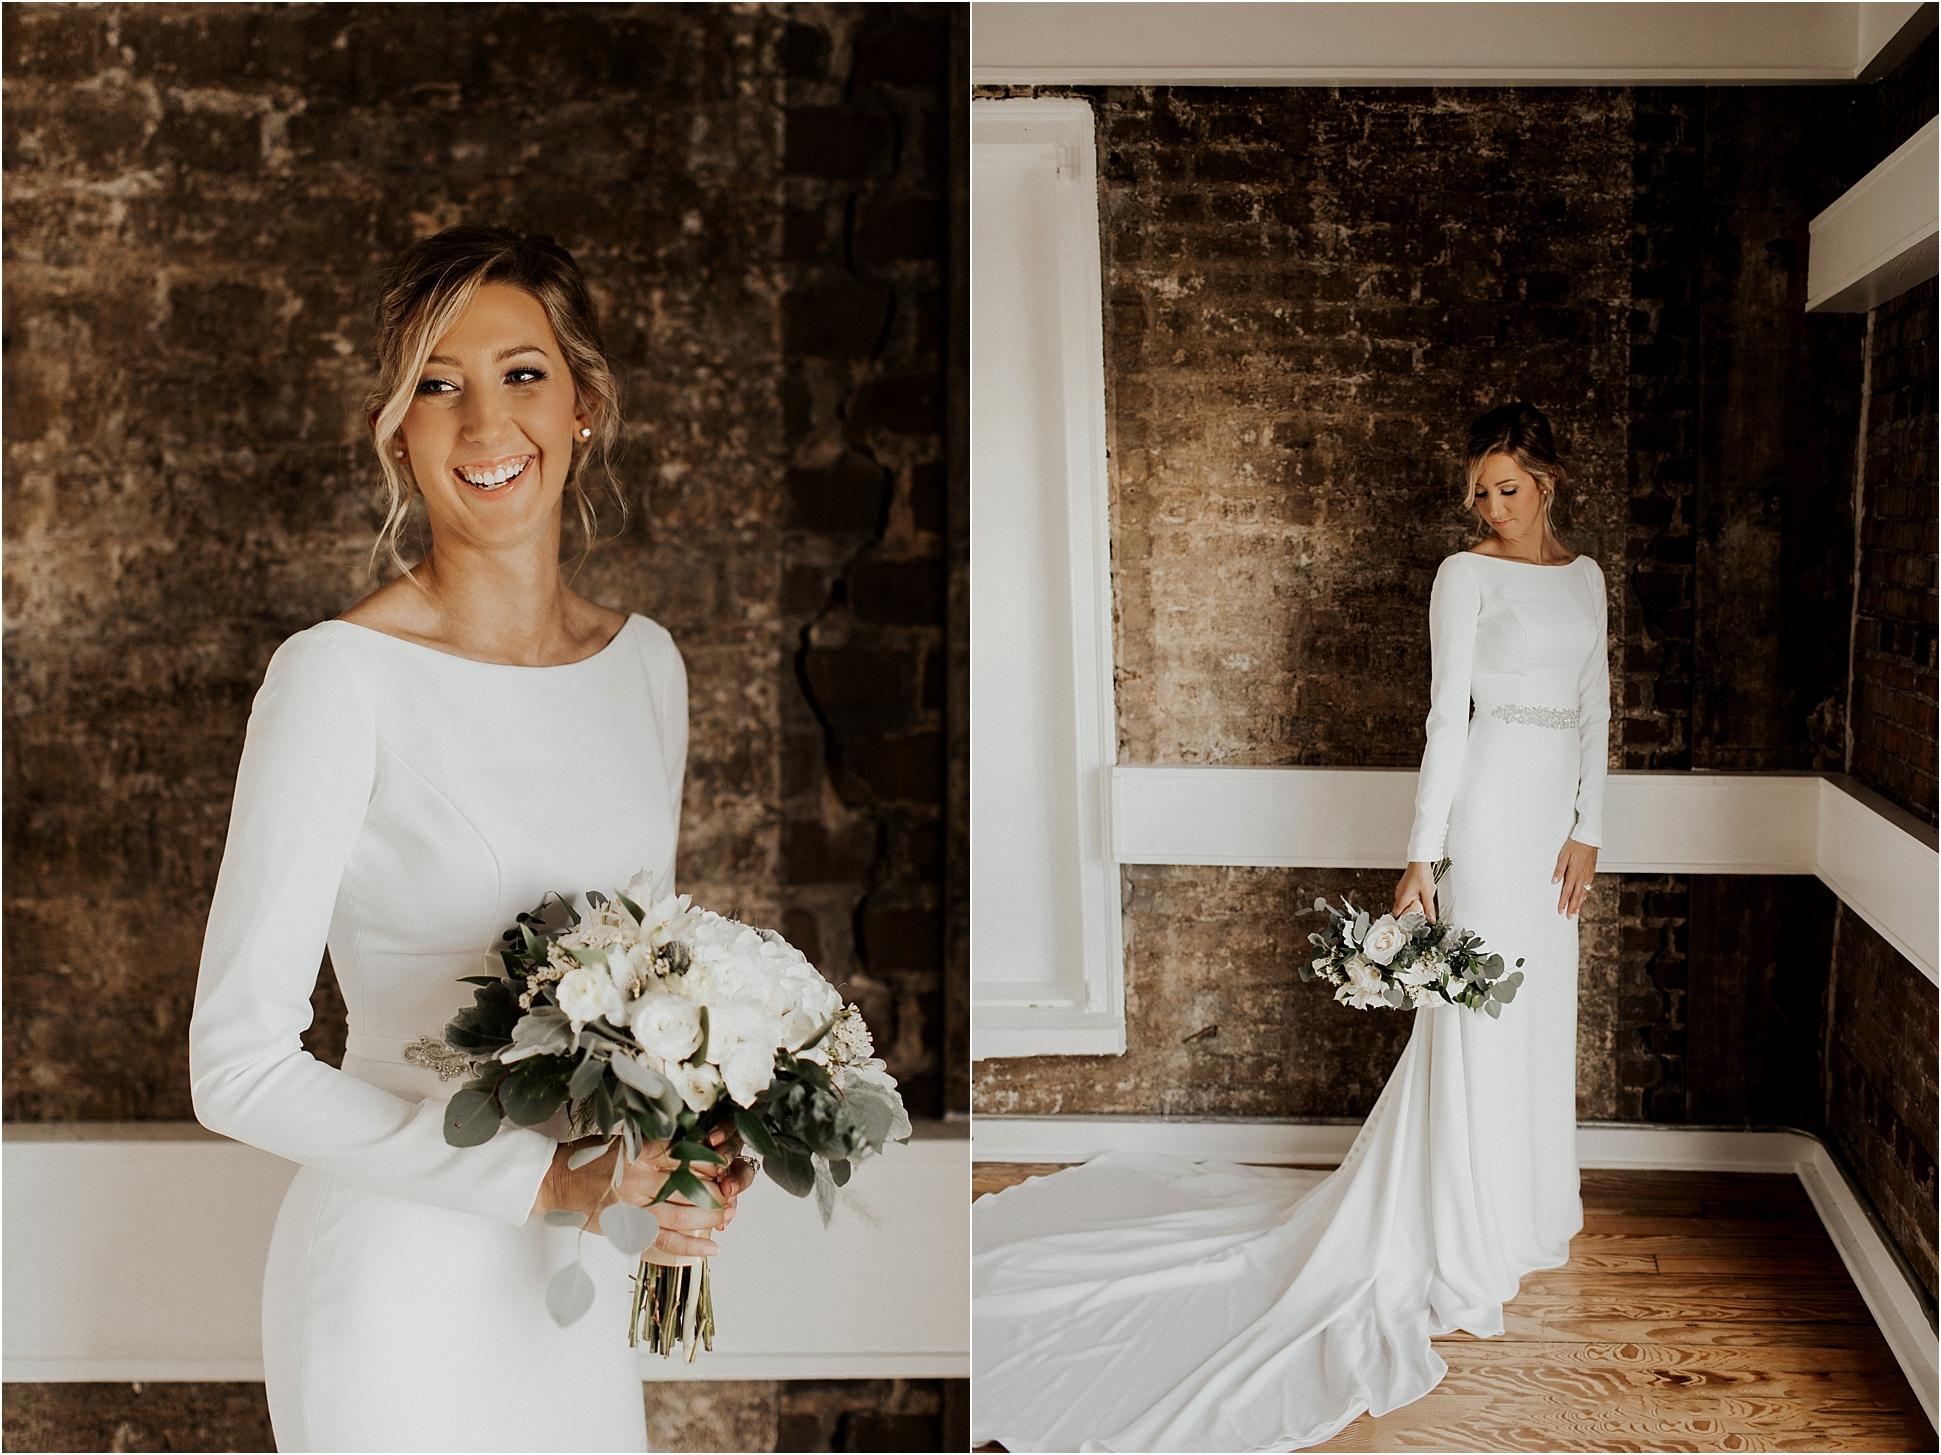 upstairs_midtown_intimate_charleston_wedding024.JPG